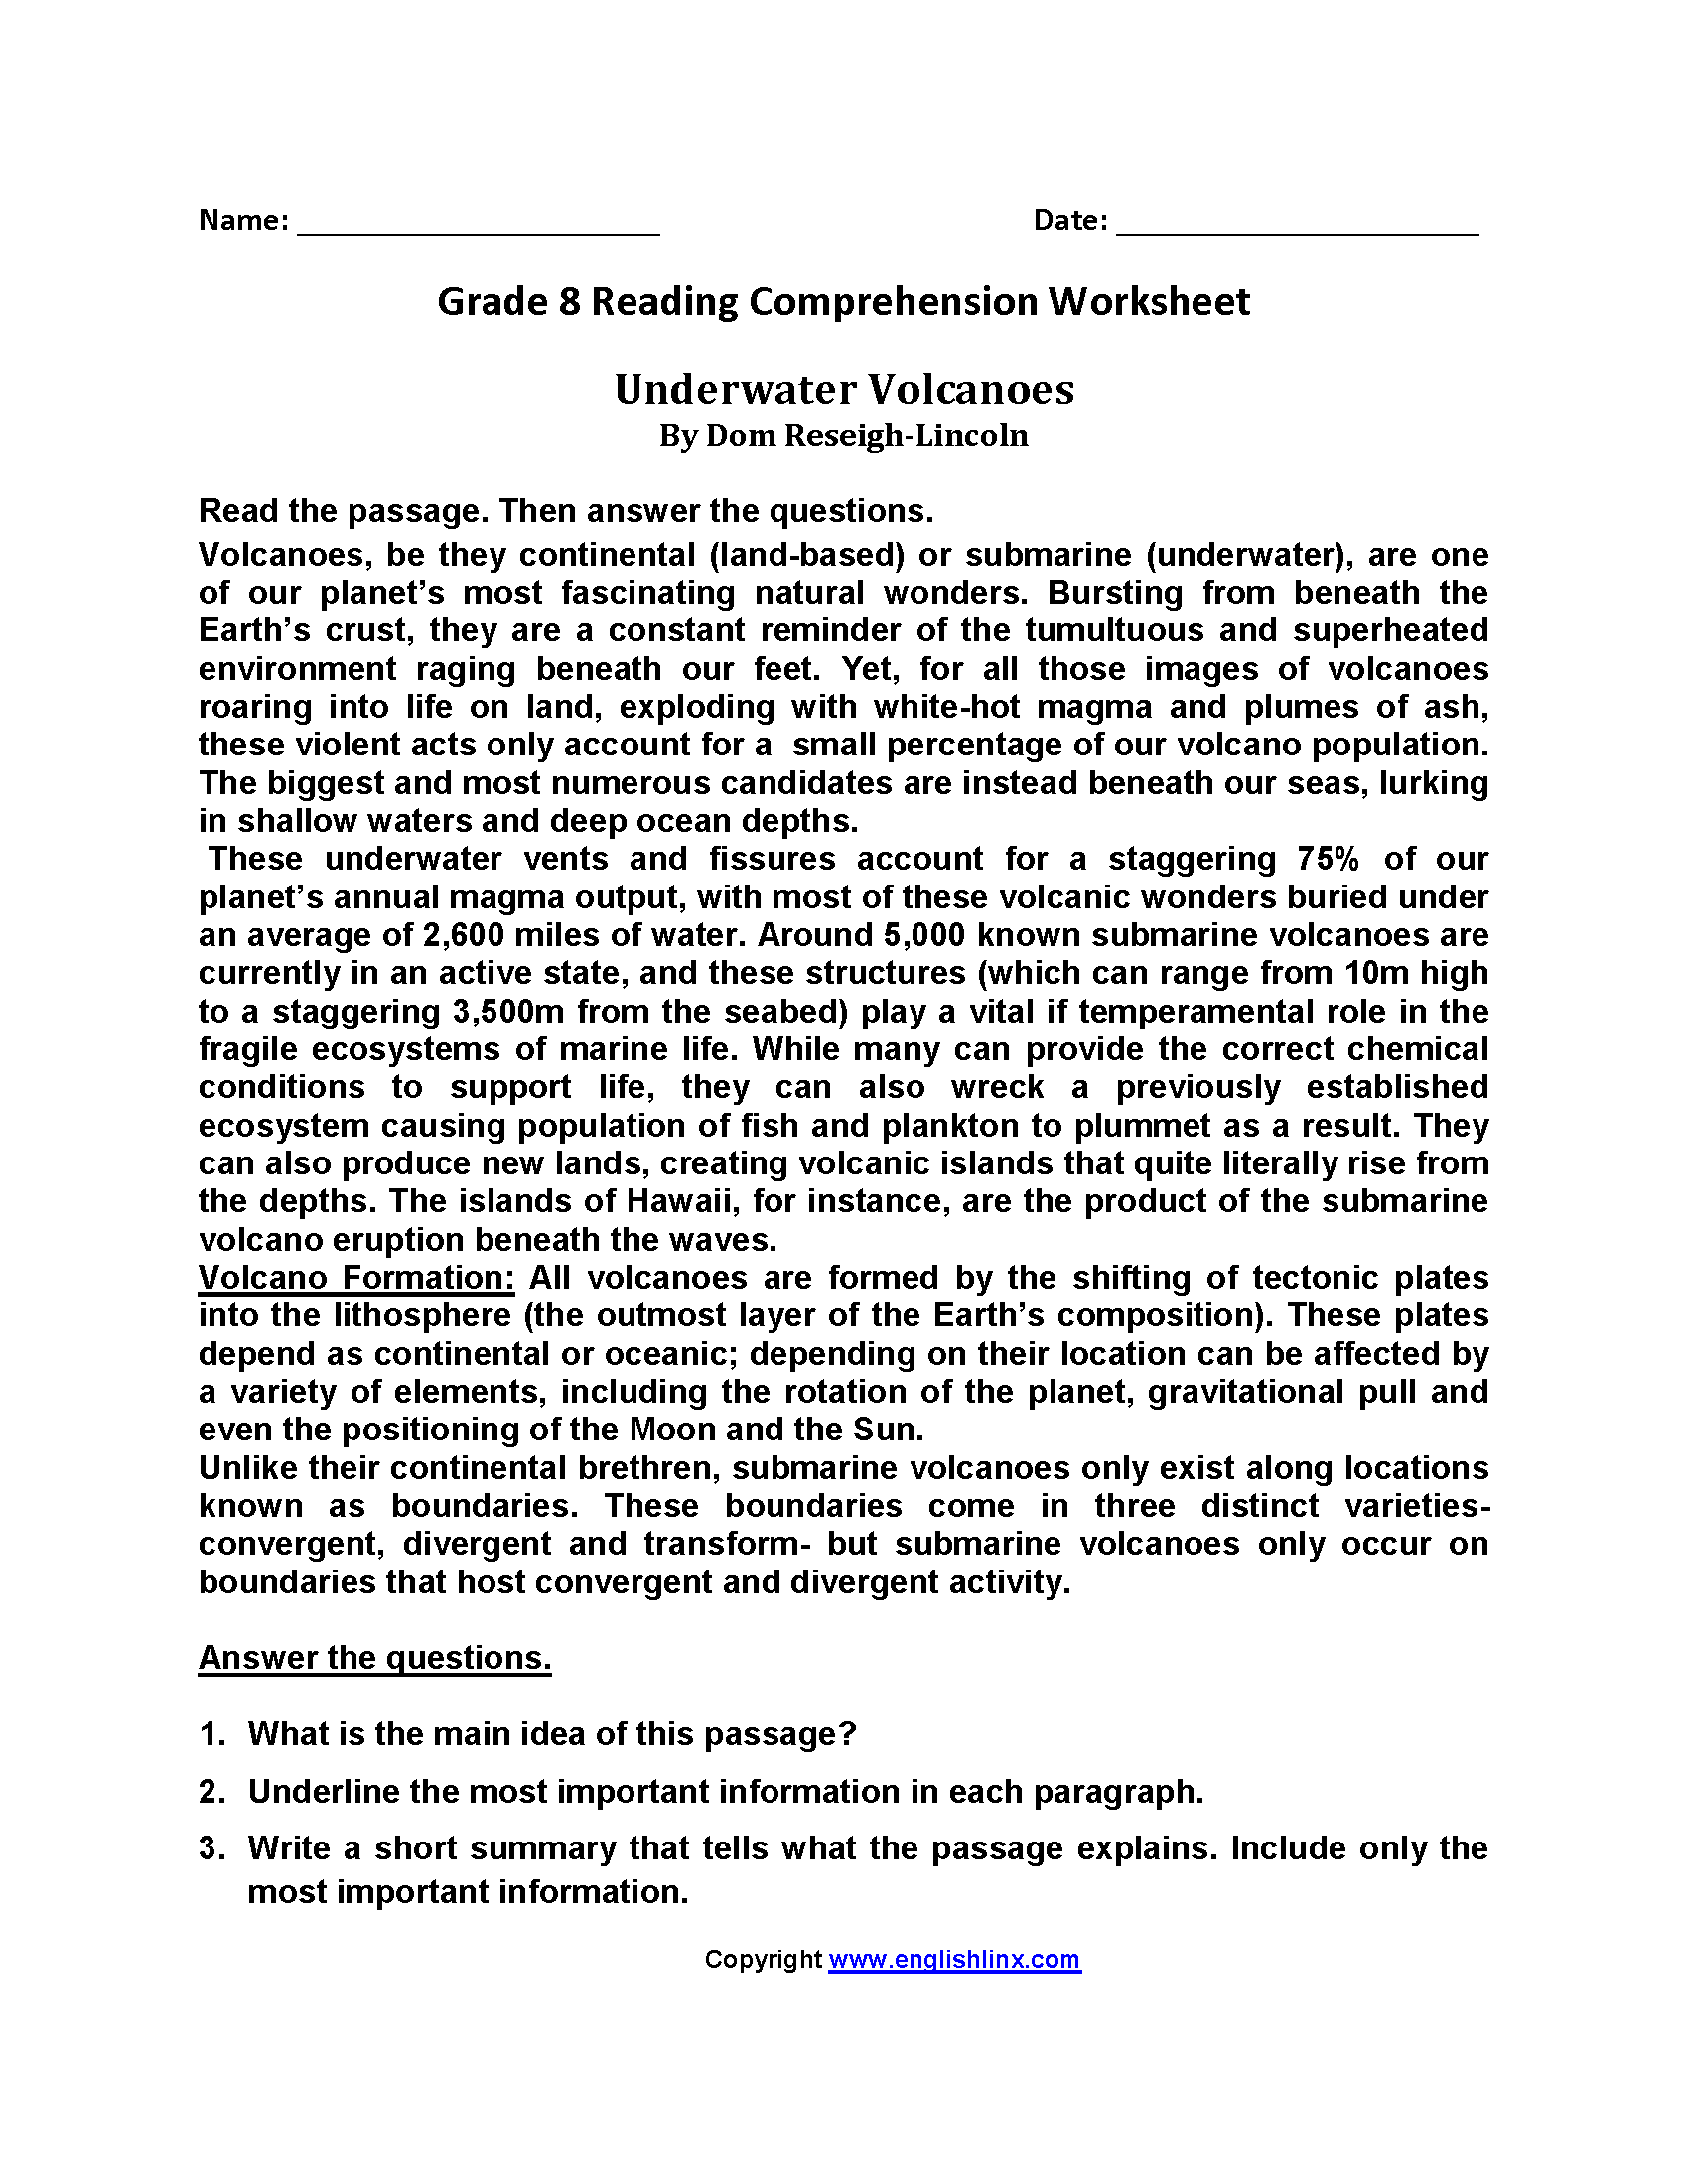 Underwater Volcanoes Eighth Grade Reading Worksheets   Reading worksheets [ 2200 x 1700 Pixel ]